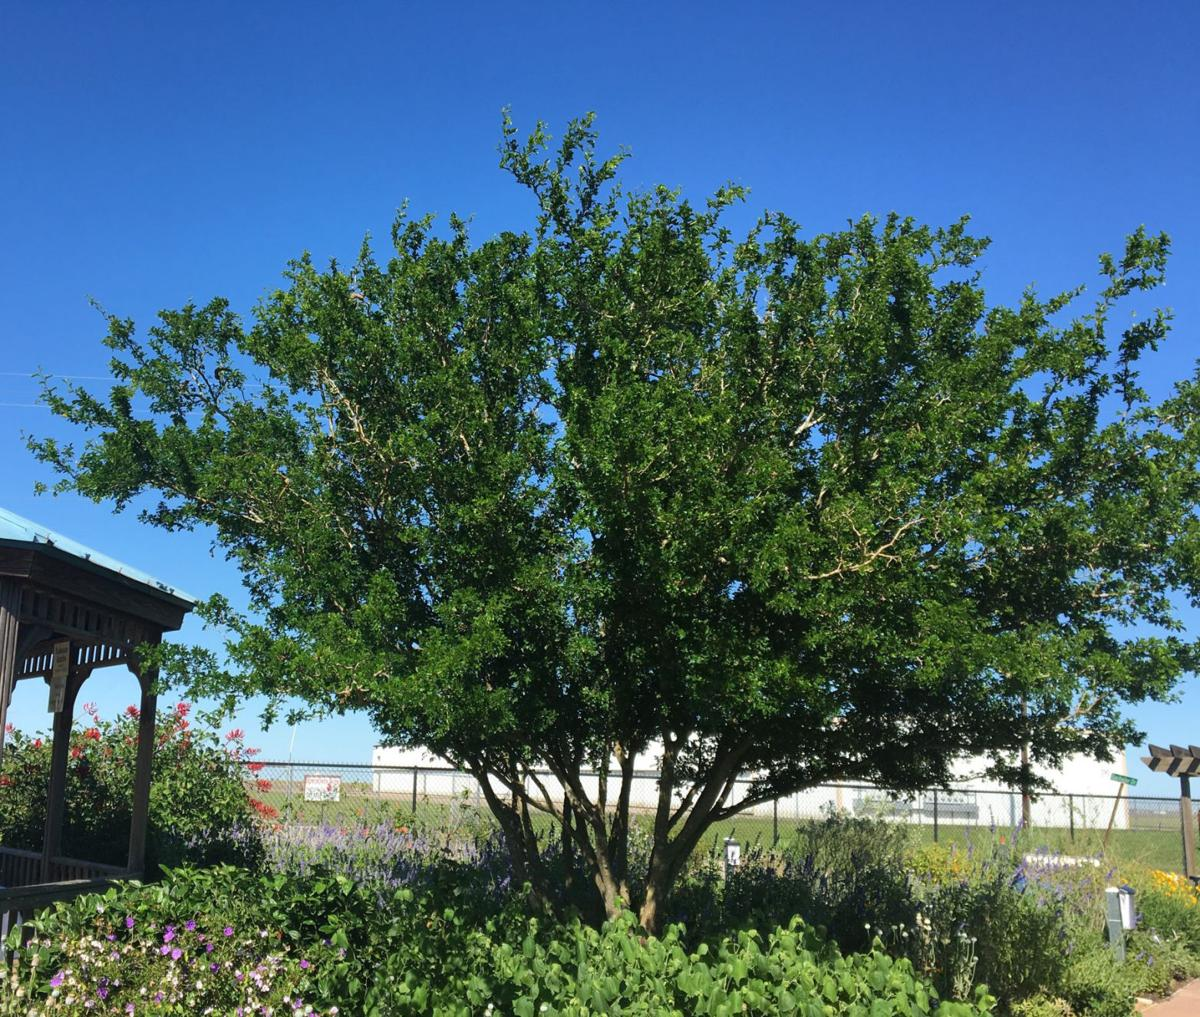 Texas Ebony Tree Is Texas Tough And Ornamental Home And Garden